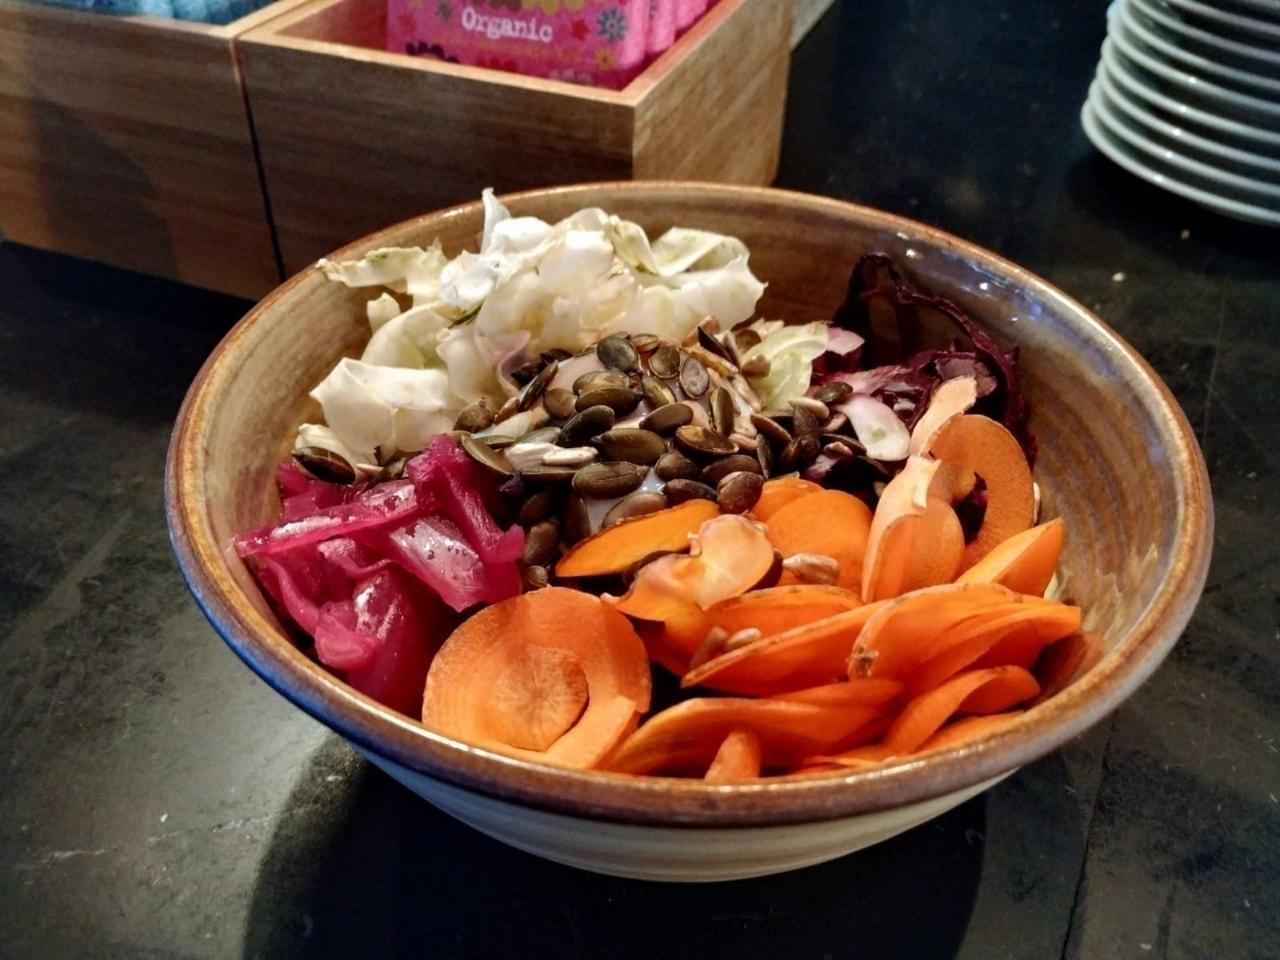 Vegetarian bowl from Fotografiska - not vegan